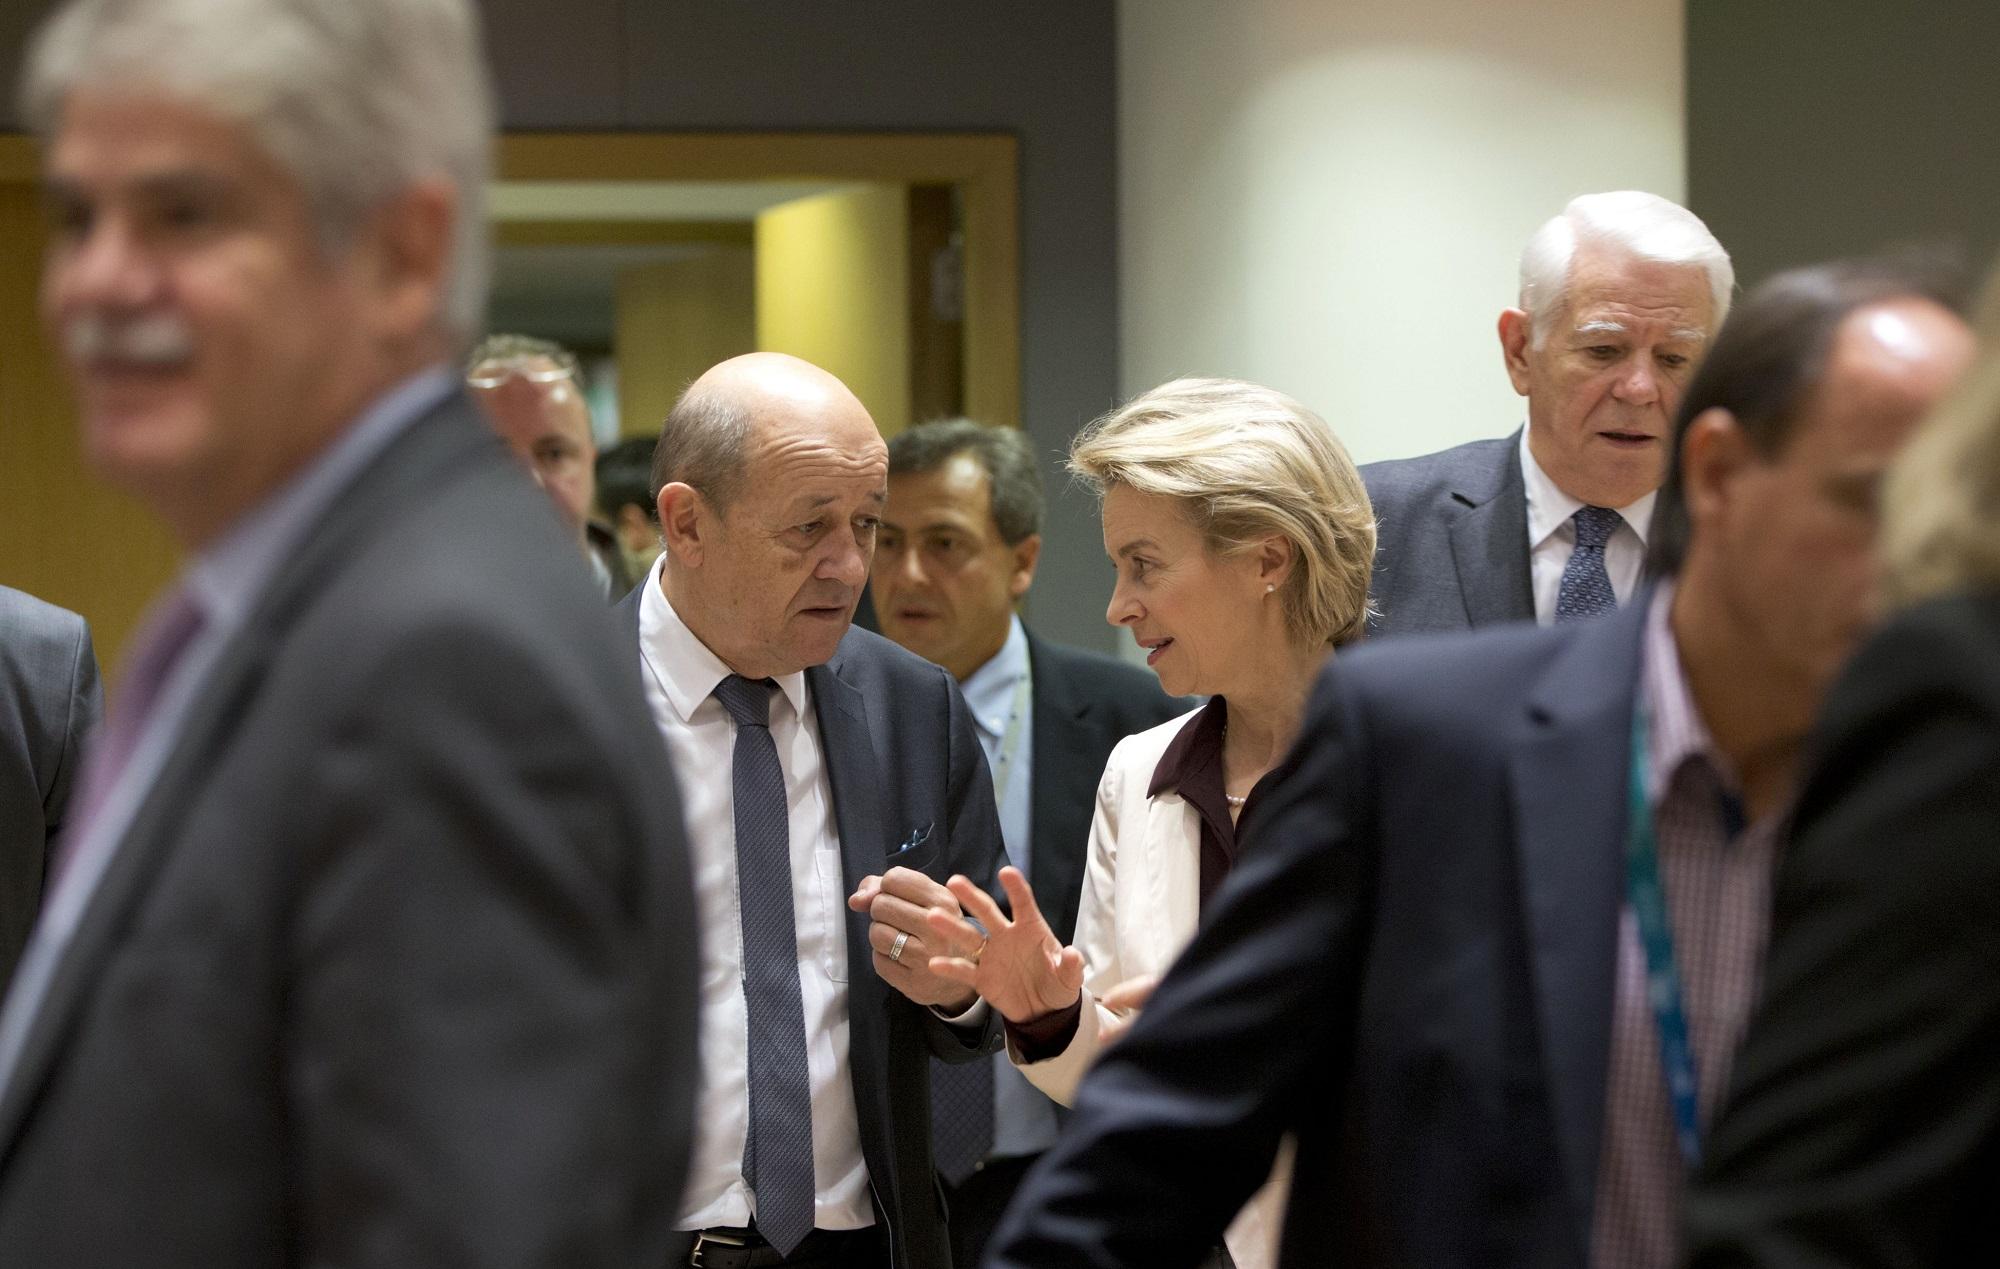 EU launches defense cooperation program, 5 members refuse